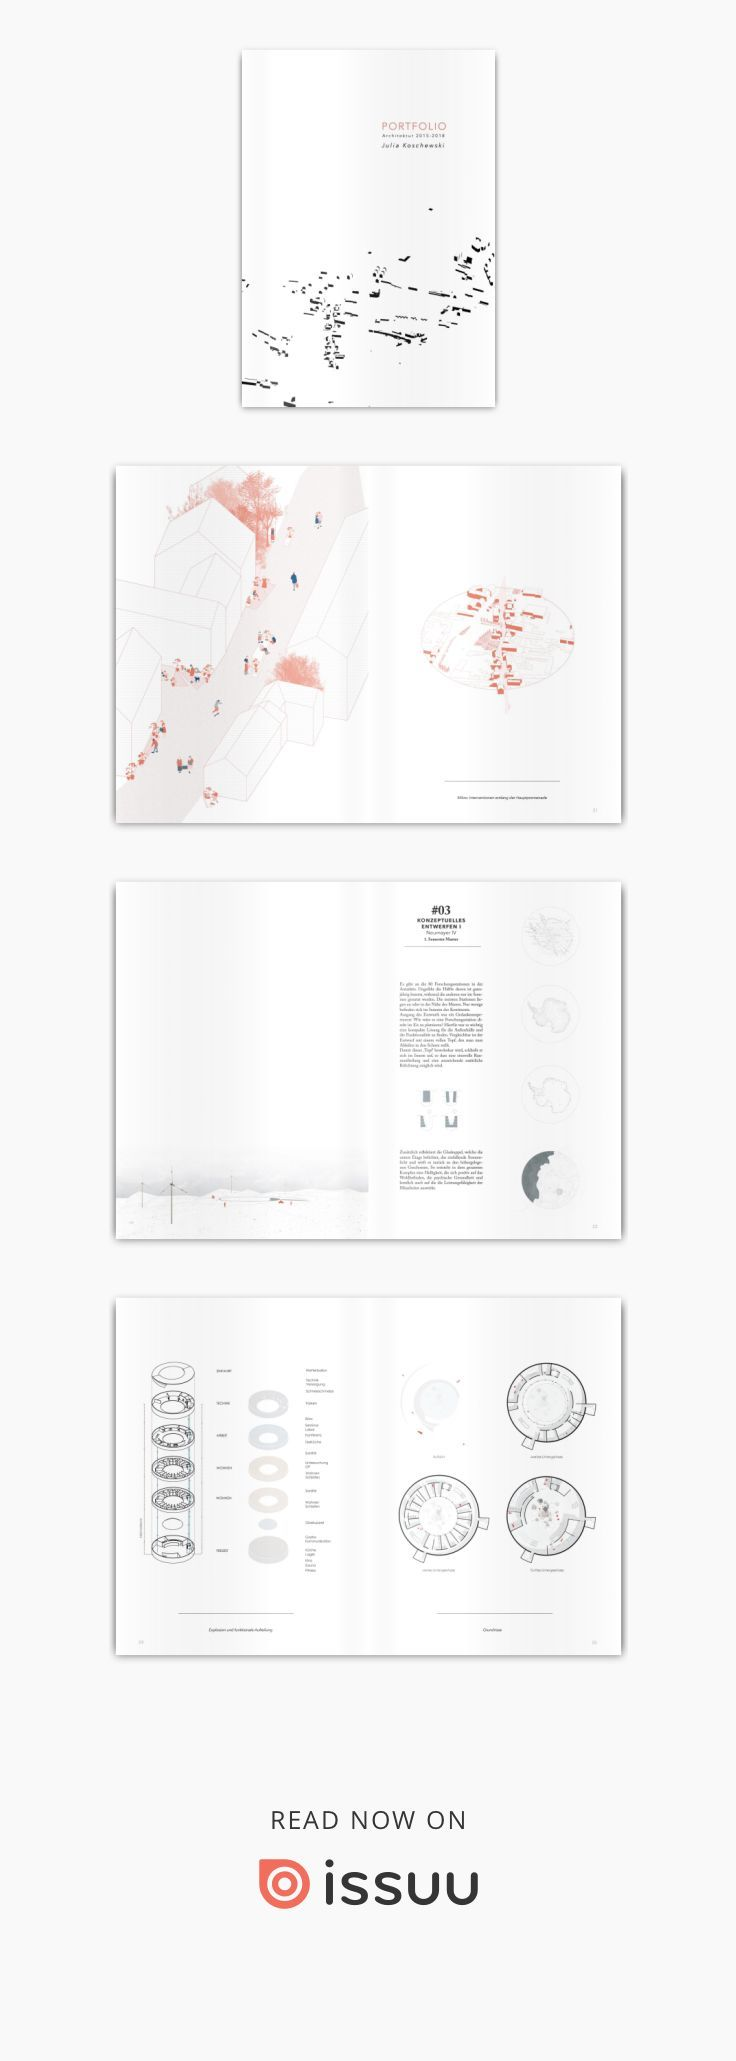 architecture portfolio 2018 by julia koschewski